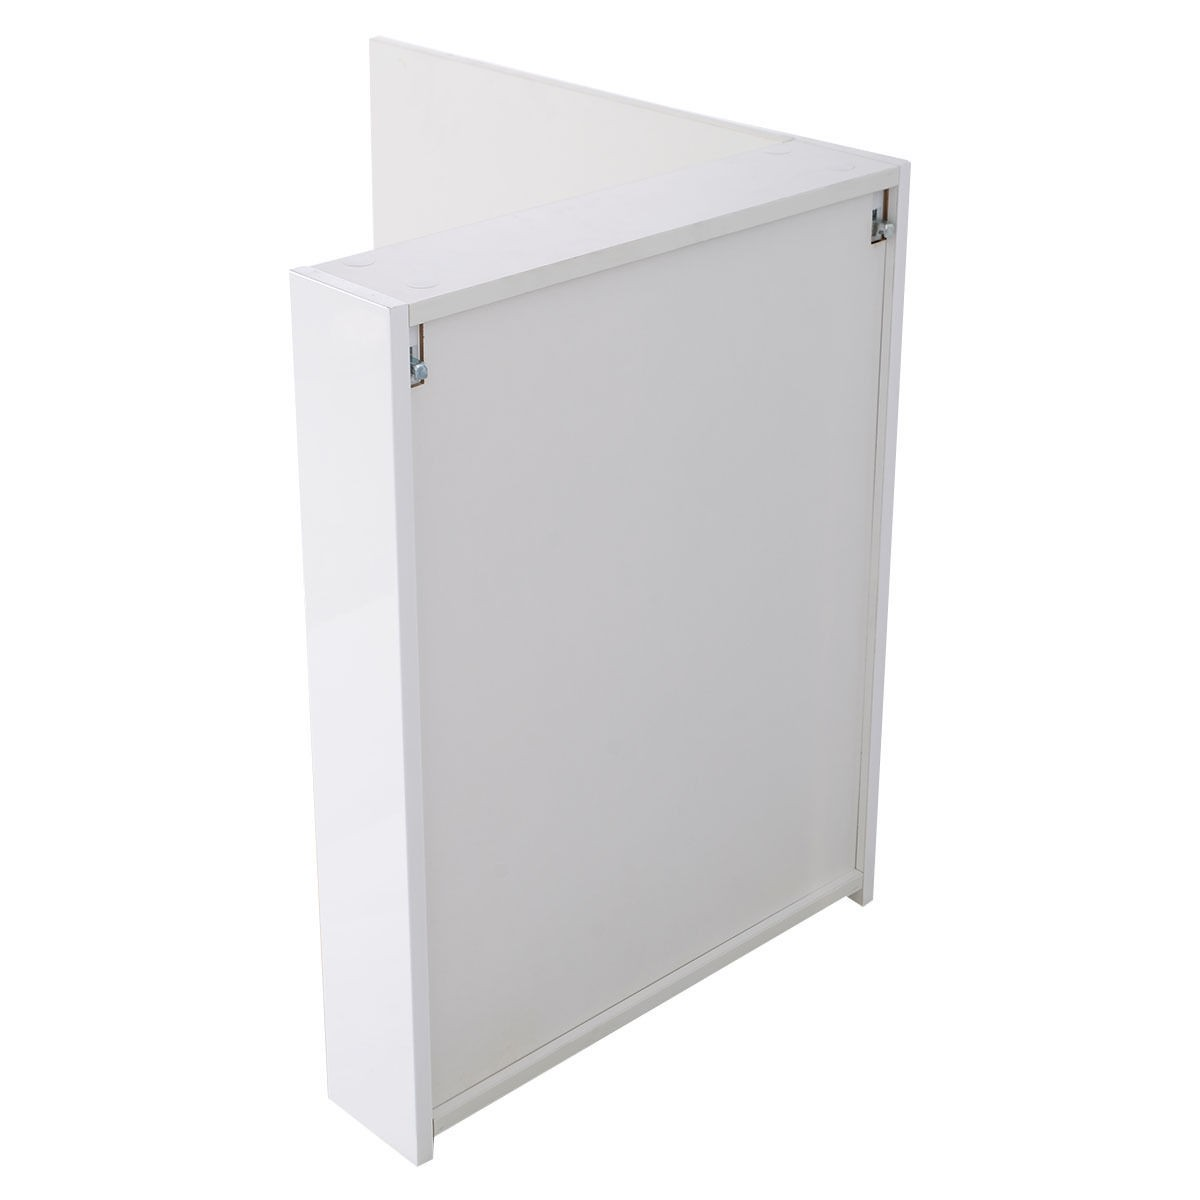 3 mirror door 36 20 wide wall mount mirrored bathroom for Bathroom cabinets 55cm wide